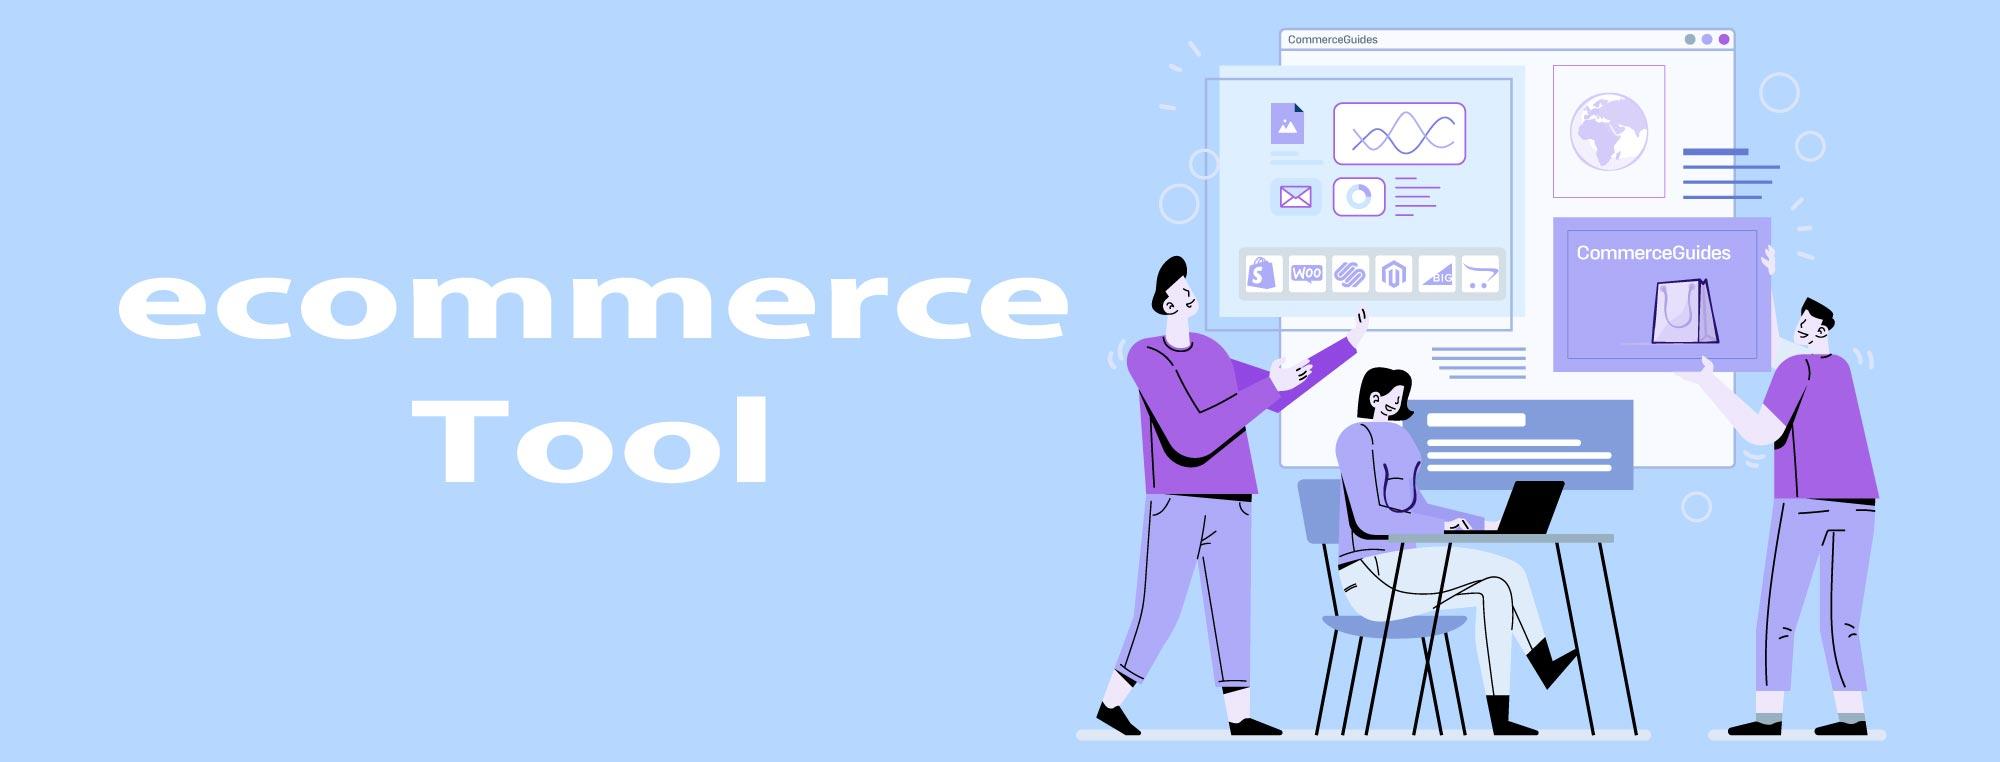 Categoria: ecommerce tool Strumenti per ecommerce